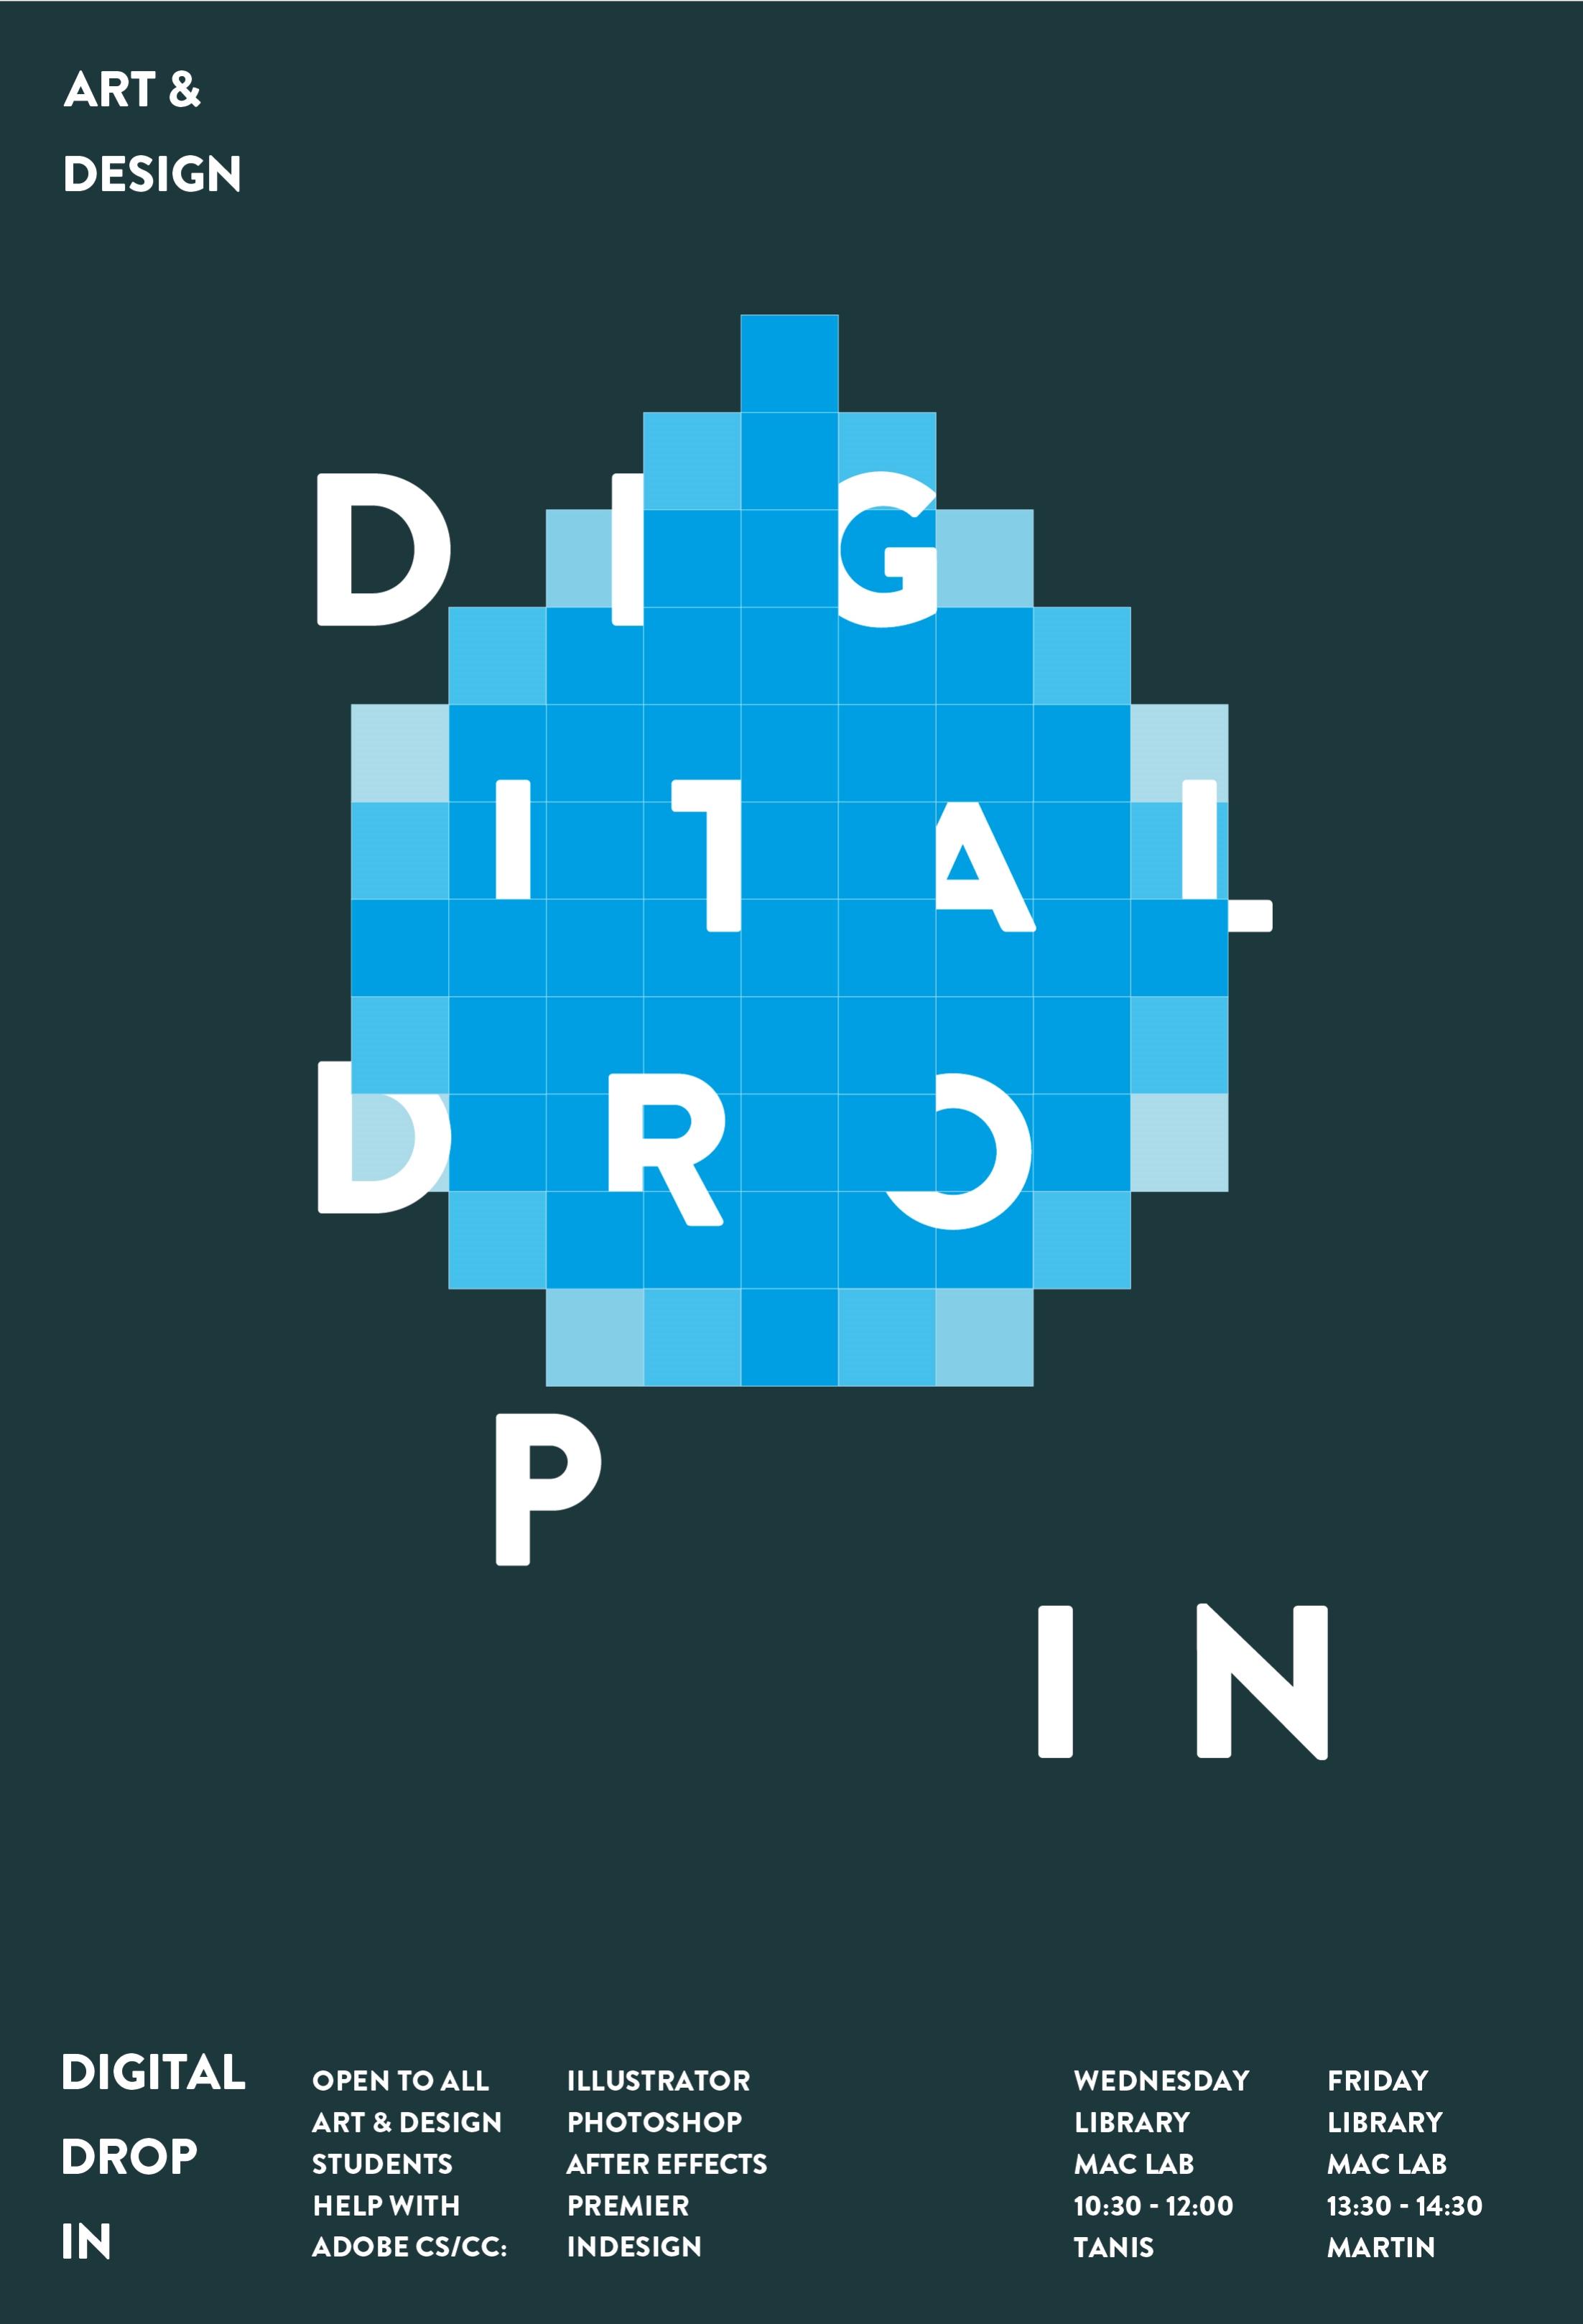 Edinburgh College _Digital Drop In Blue_Digital Drop In Blue.jpg